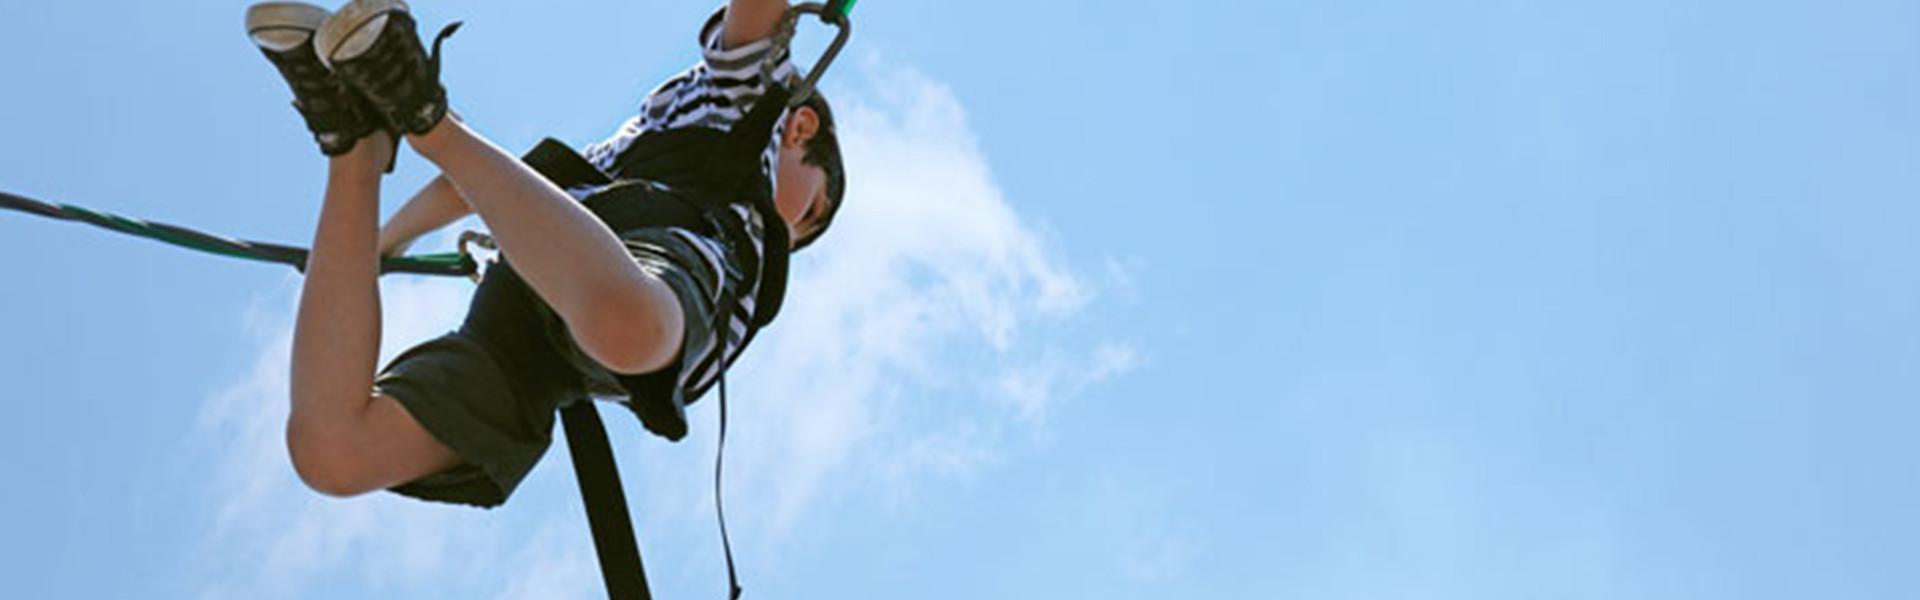 Florida Bungee Jumping near Orlando | Kid Bungee Jumping at Ranch